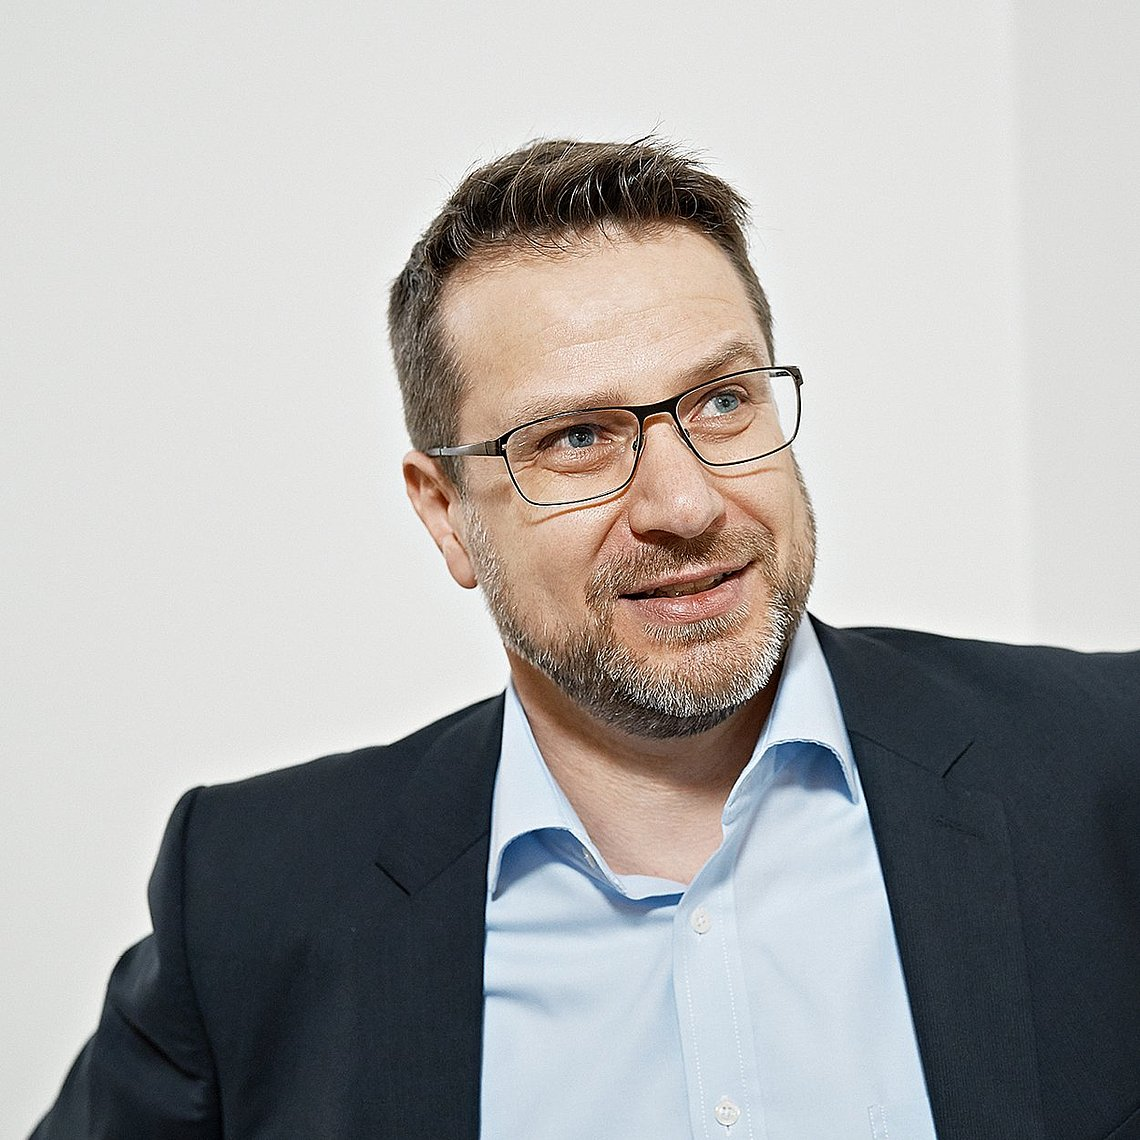 Portrait of Dr. Bernd Pape, Head of Digitization in Körbers Business Area Tobacco